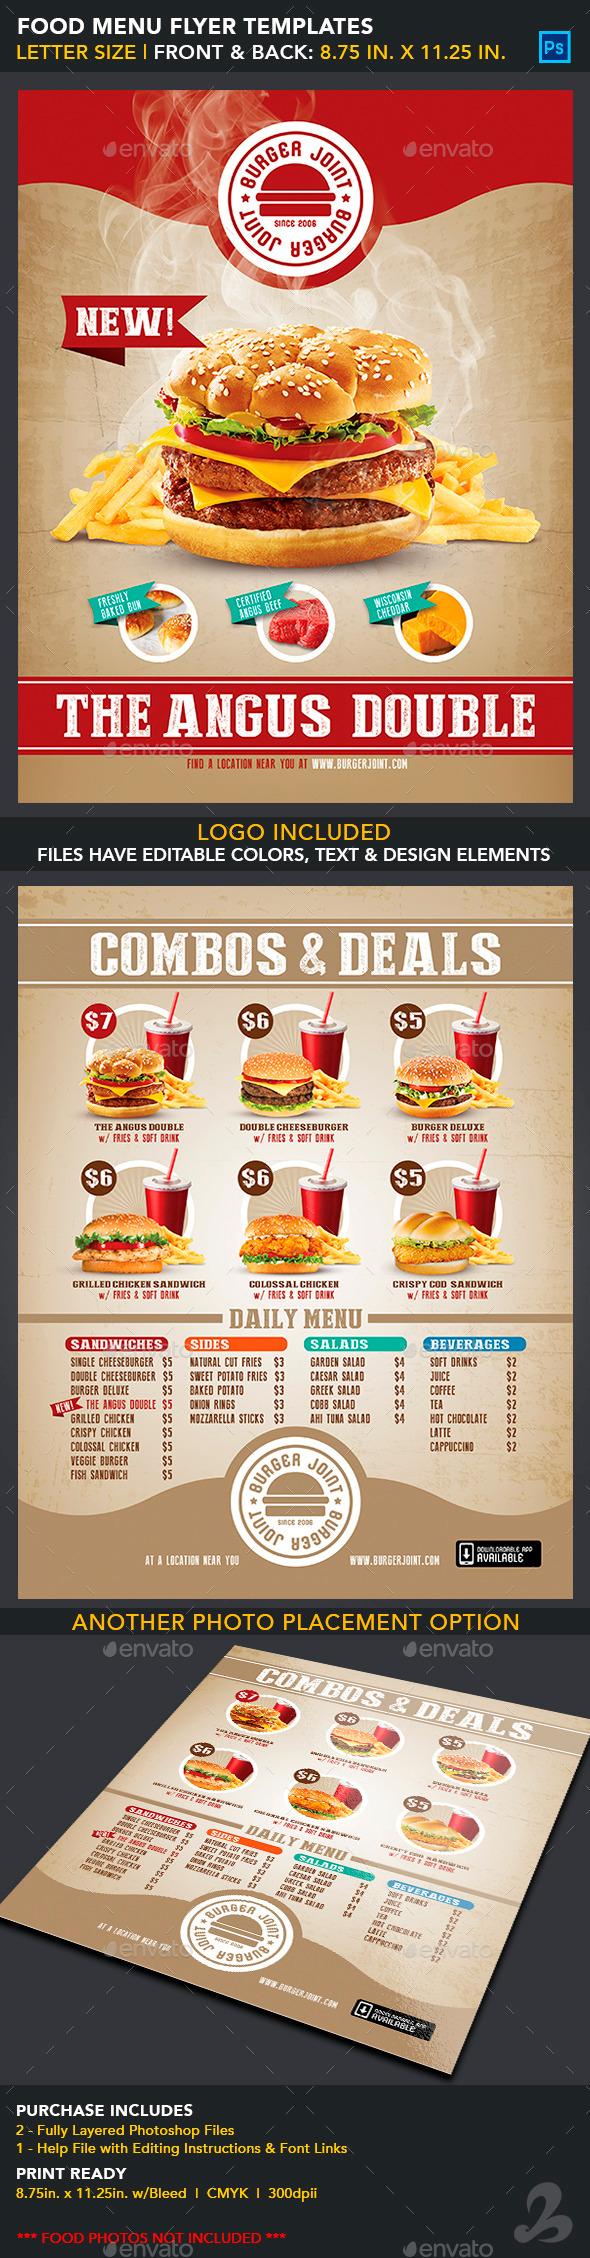 Food Menu Flyer Templates - Burger Joint - Food Menus Print Templates